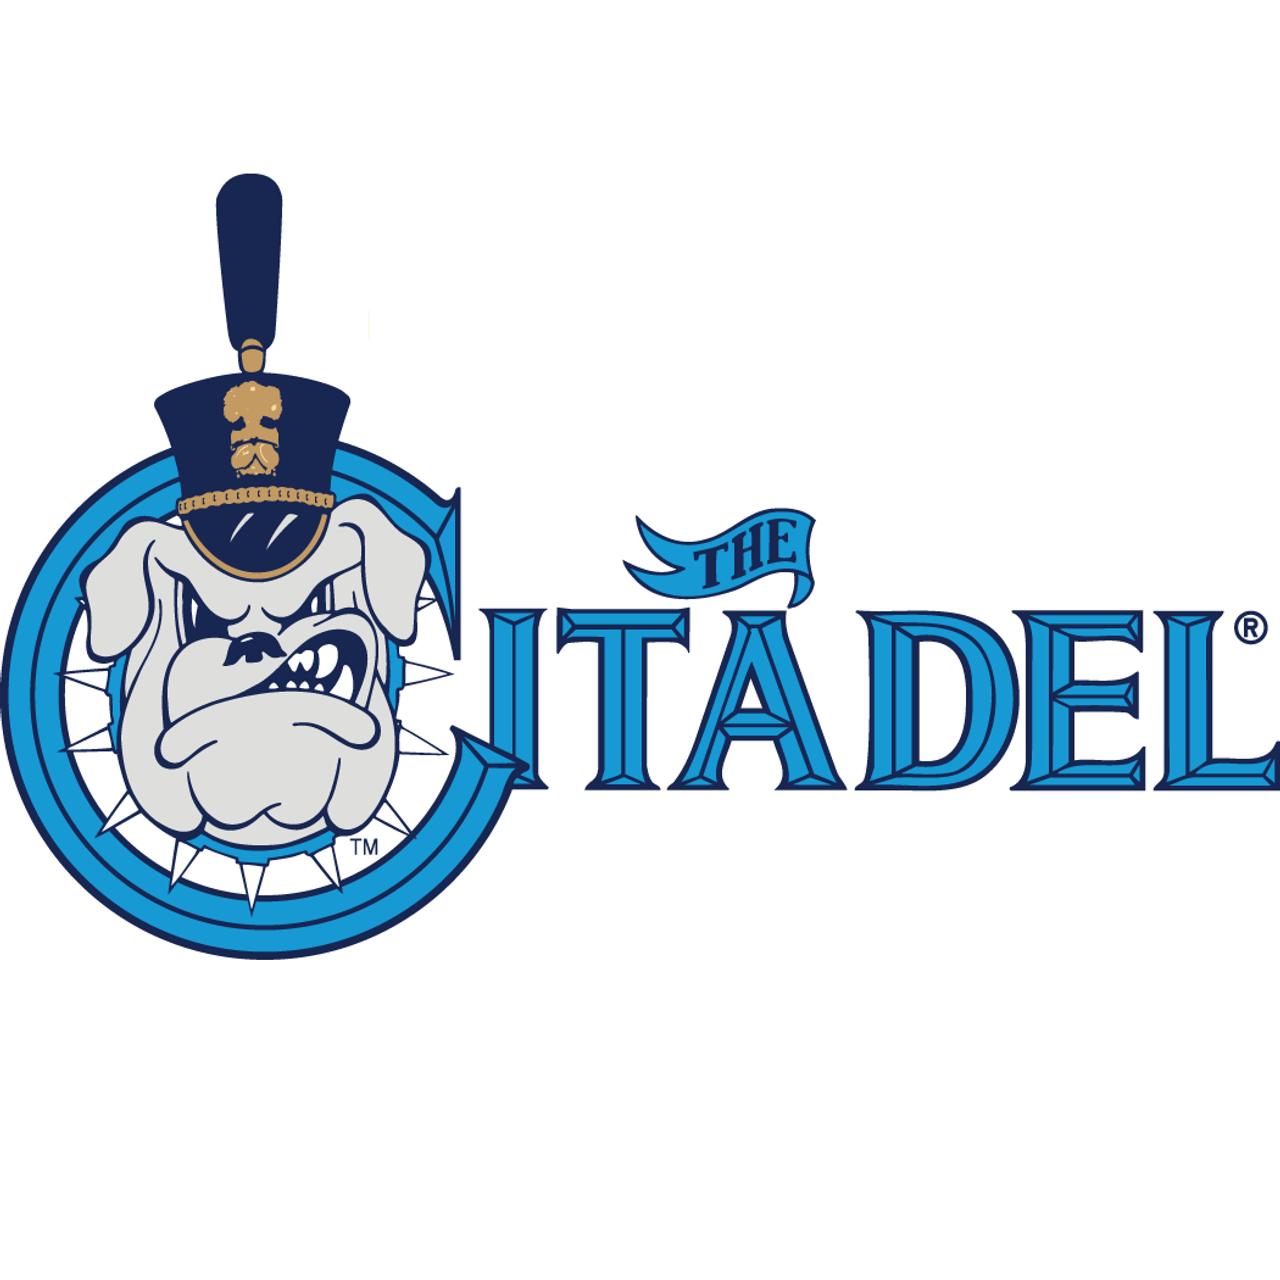 The Citadel University Bulldogs